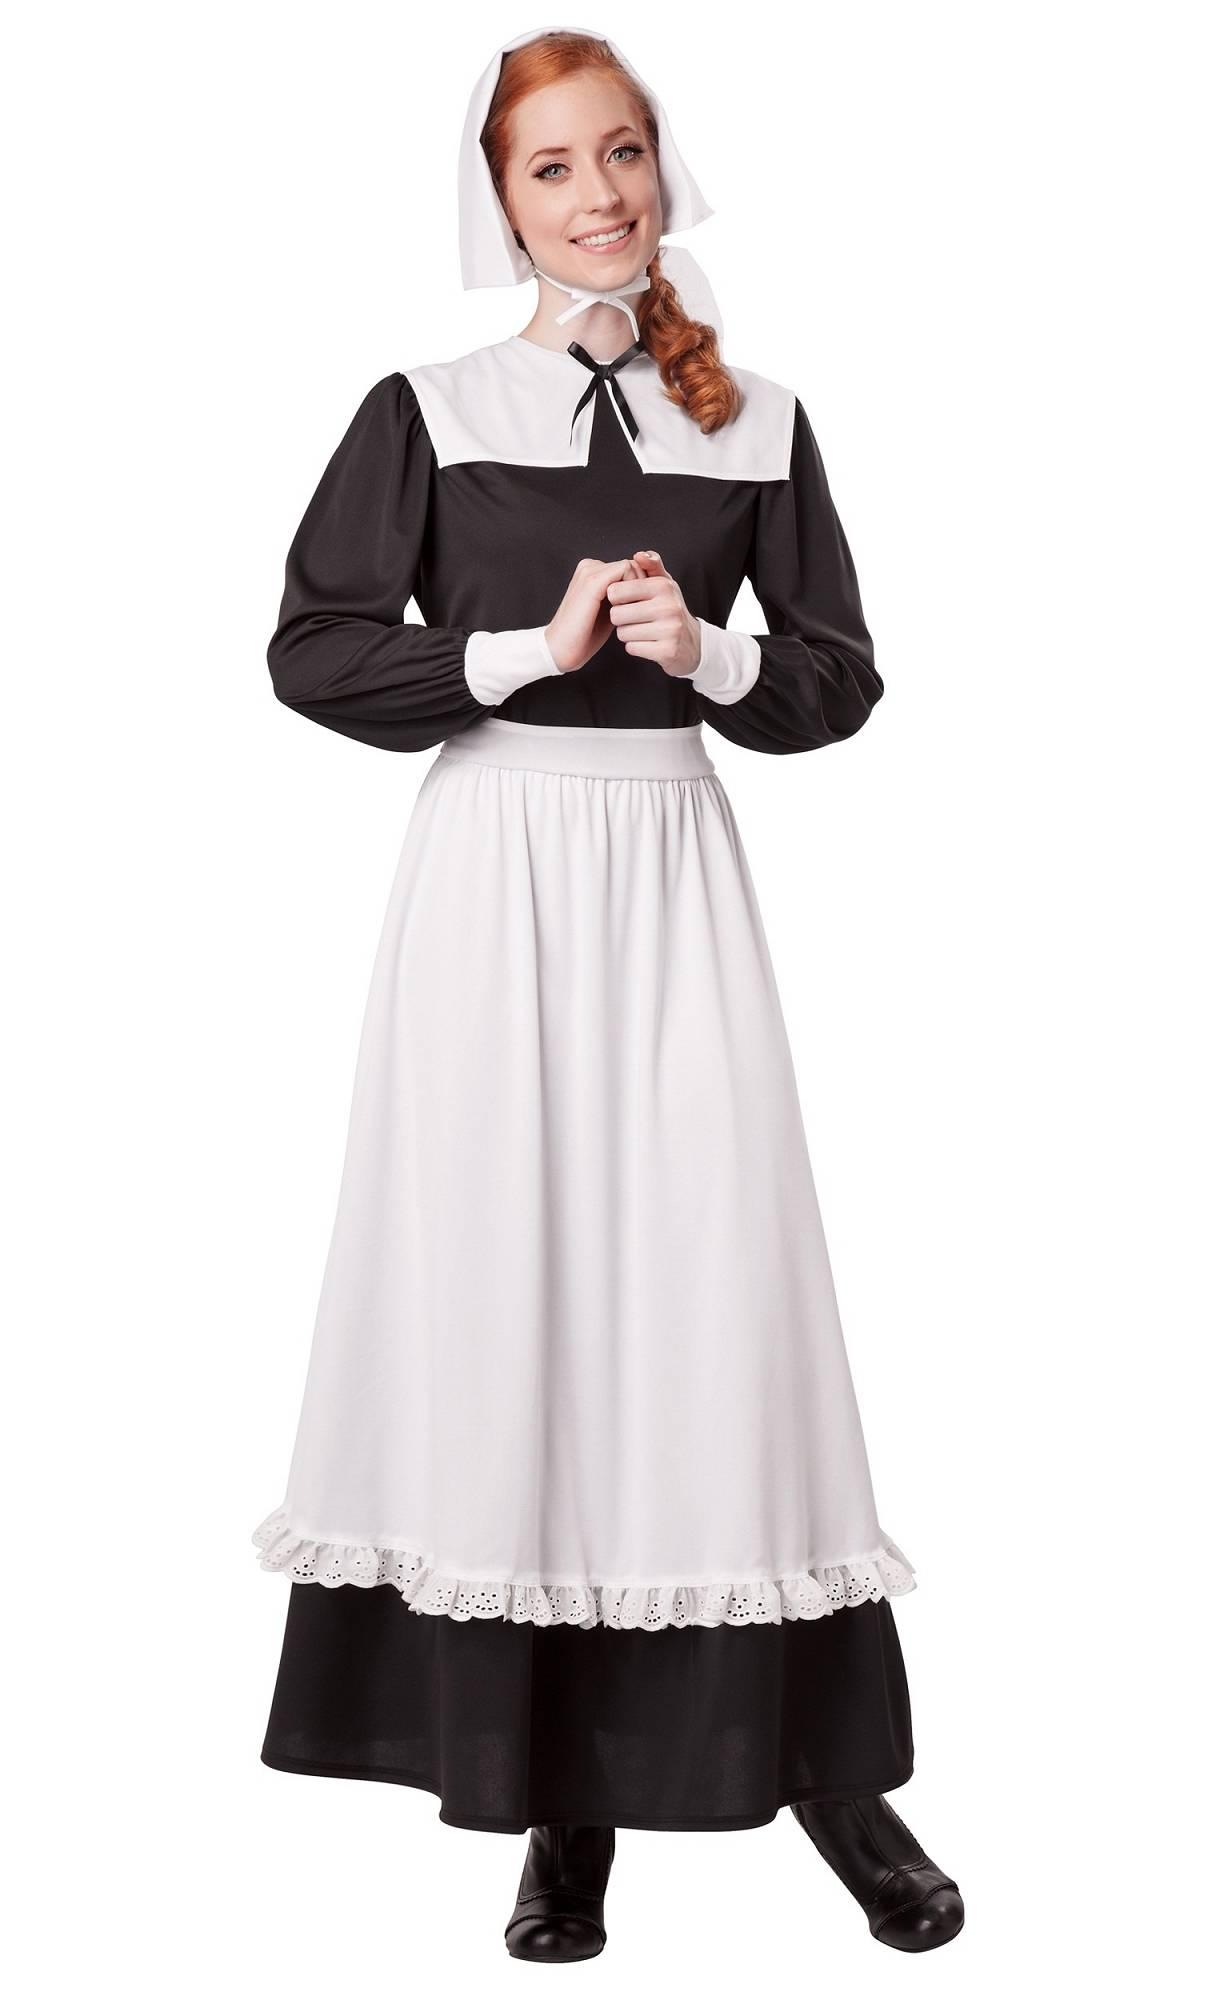 Costume-Soubrette-1900